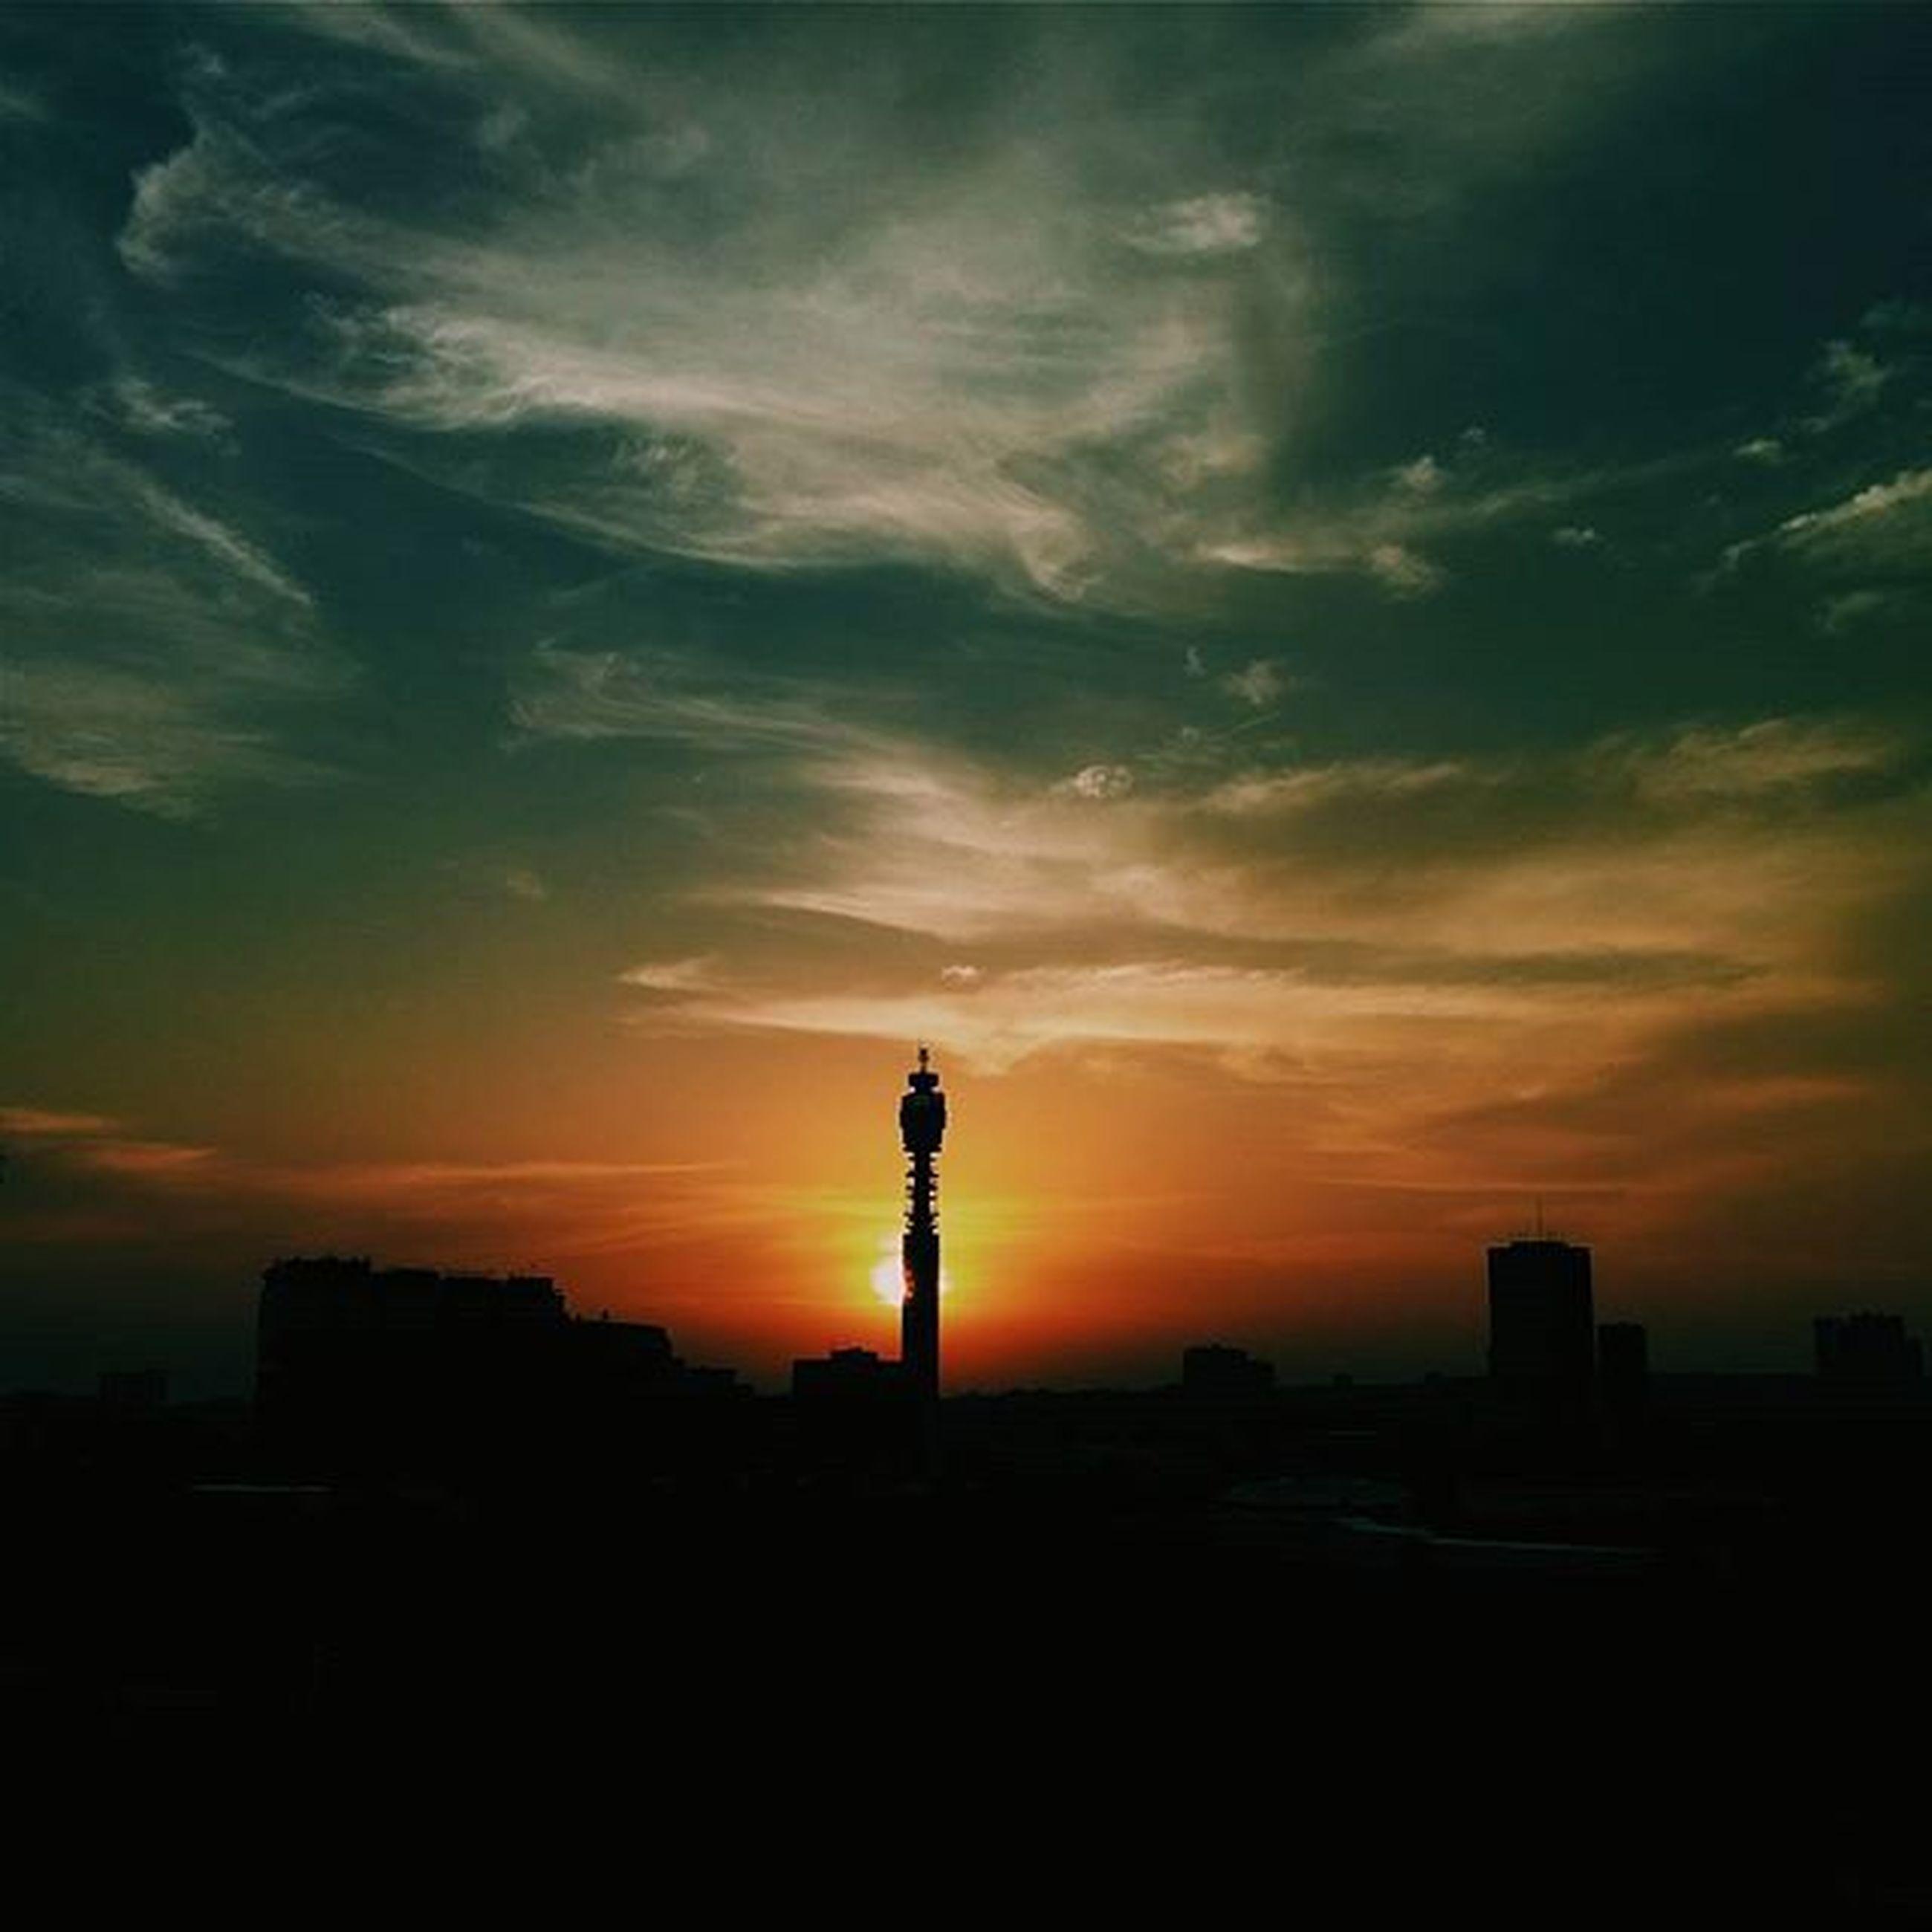 sunset, silhouette, building exterior, built structure, sky, architecture, orange color, cloud - sky, city, cloud, outline, scenics, beauty in nature, nature, outdoors, dusk, dramatic sky, cloudy, no people, building